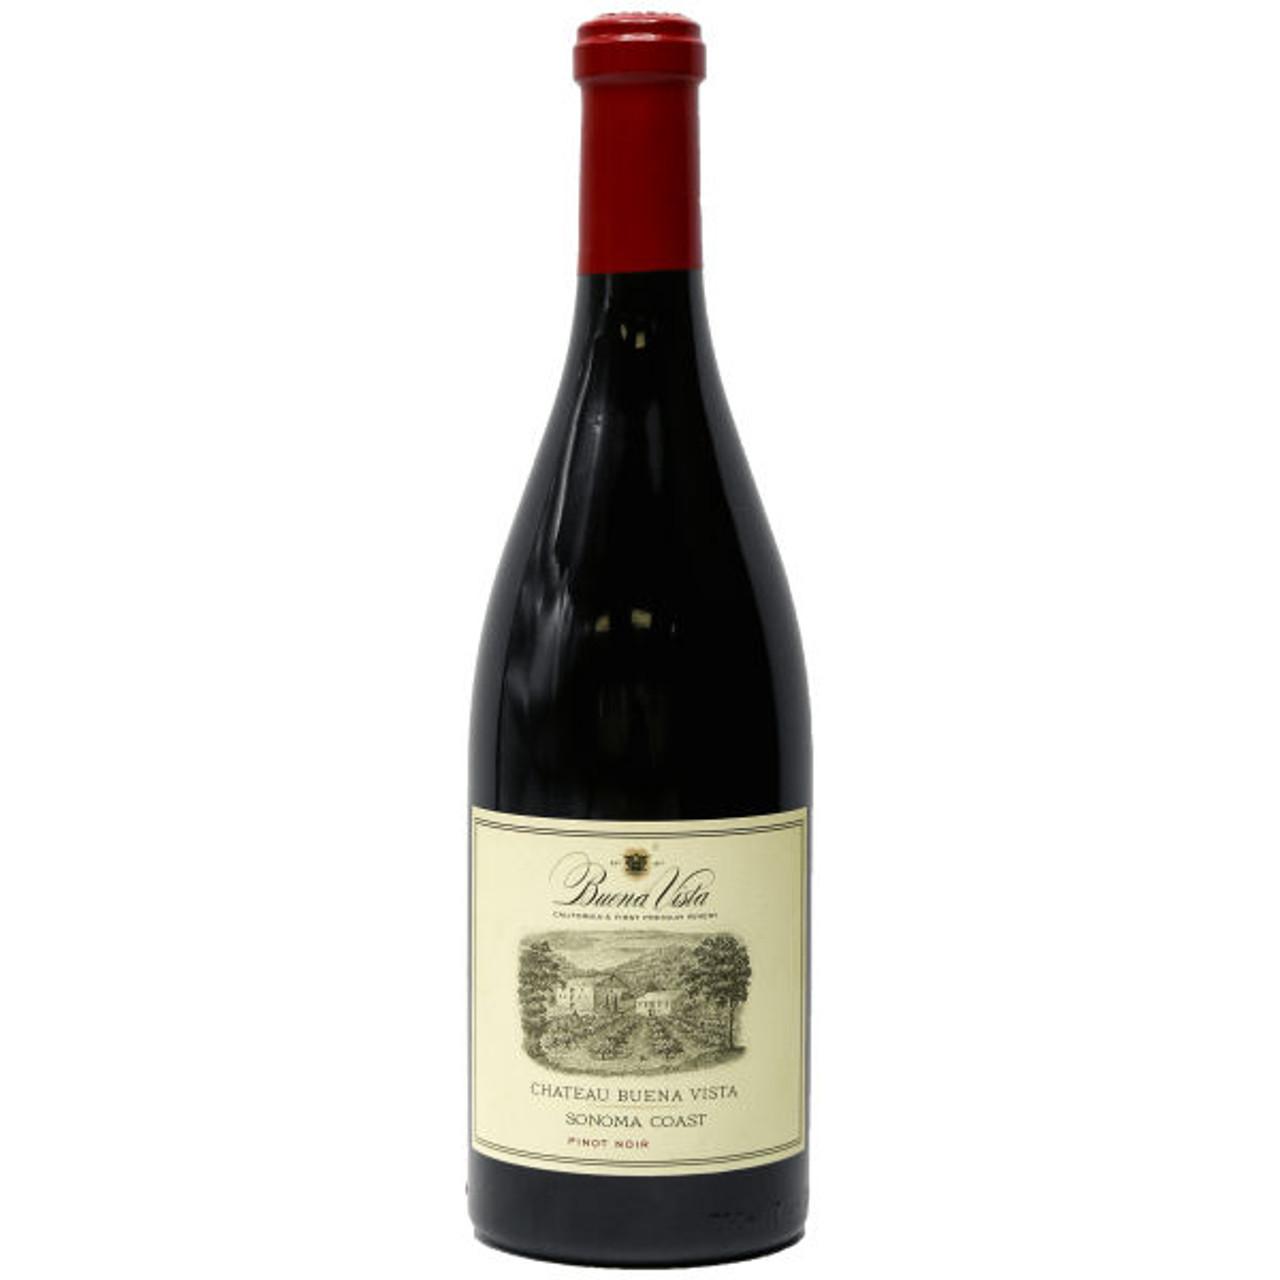 Chateau Buena Vista Sonoma Coast Pinot Noir